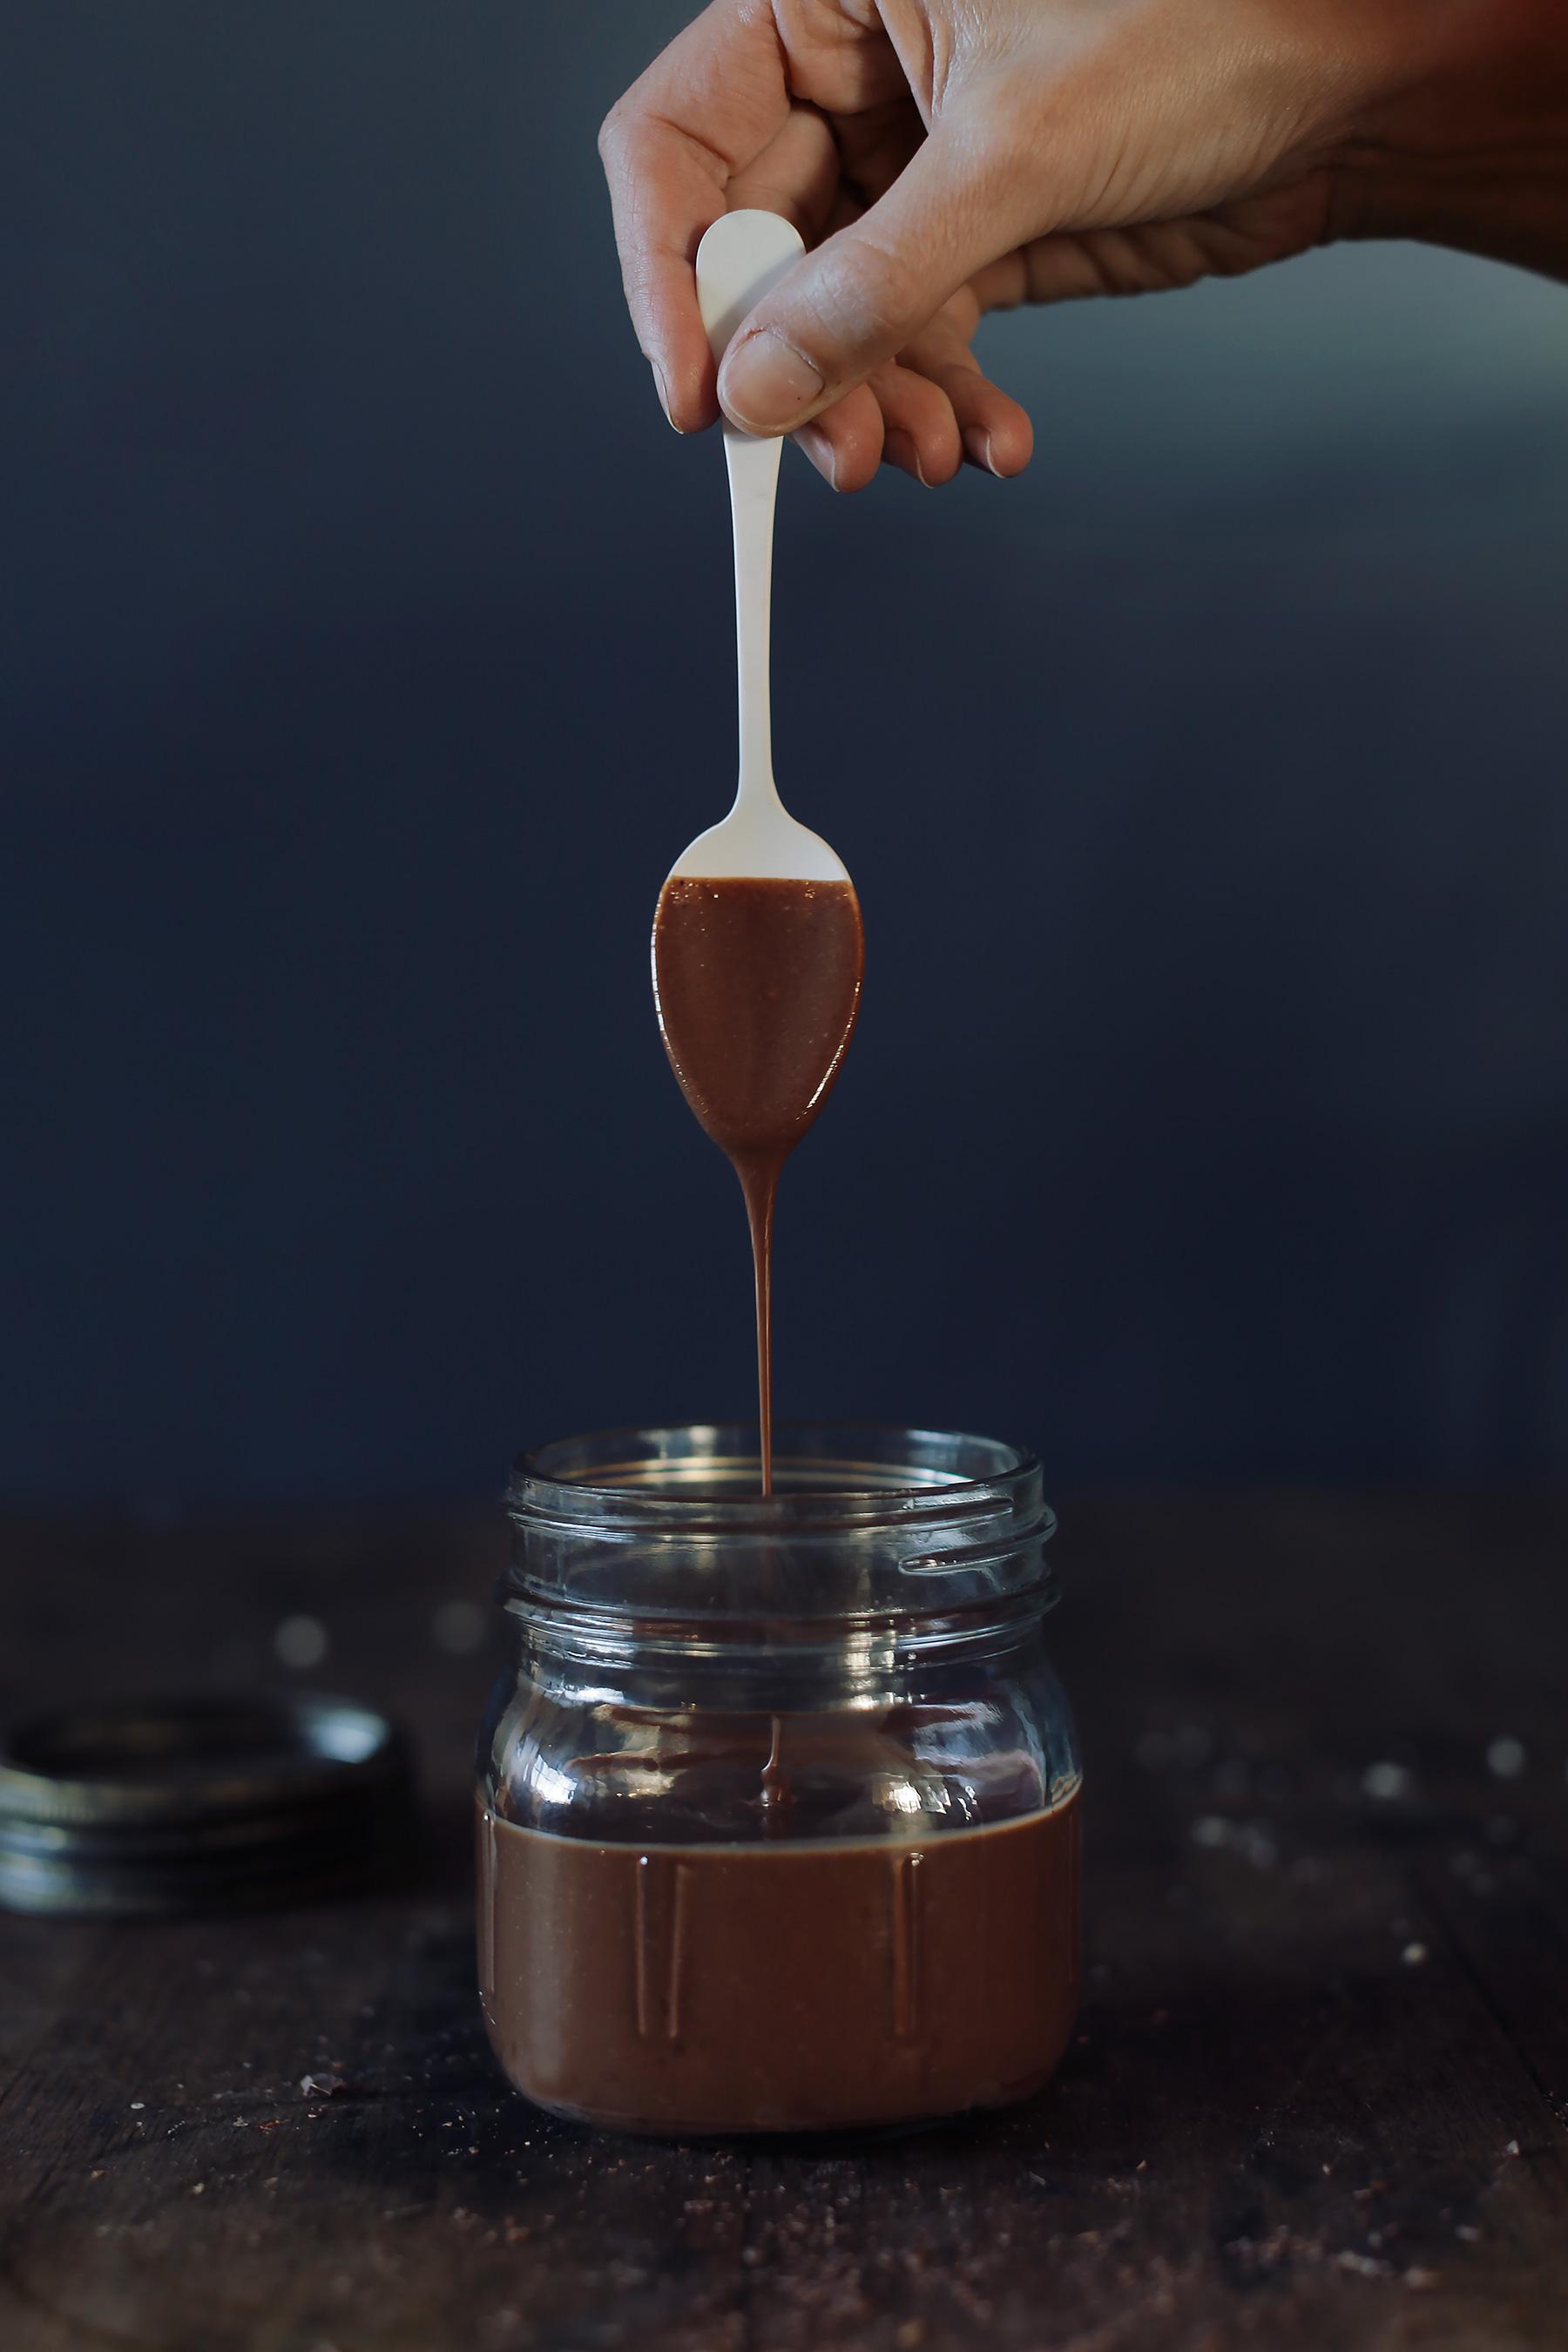 Homemade-vegan-nutella-2